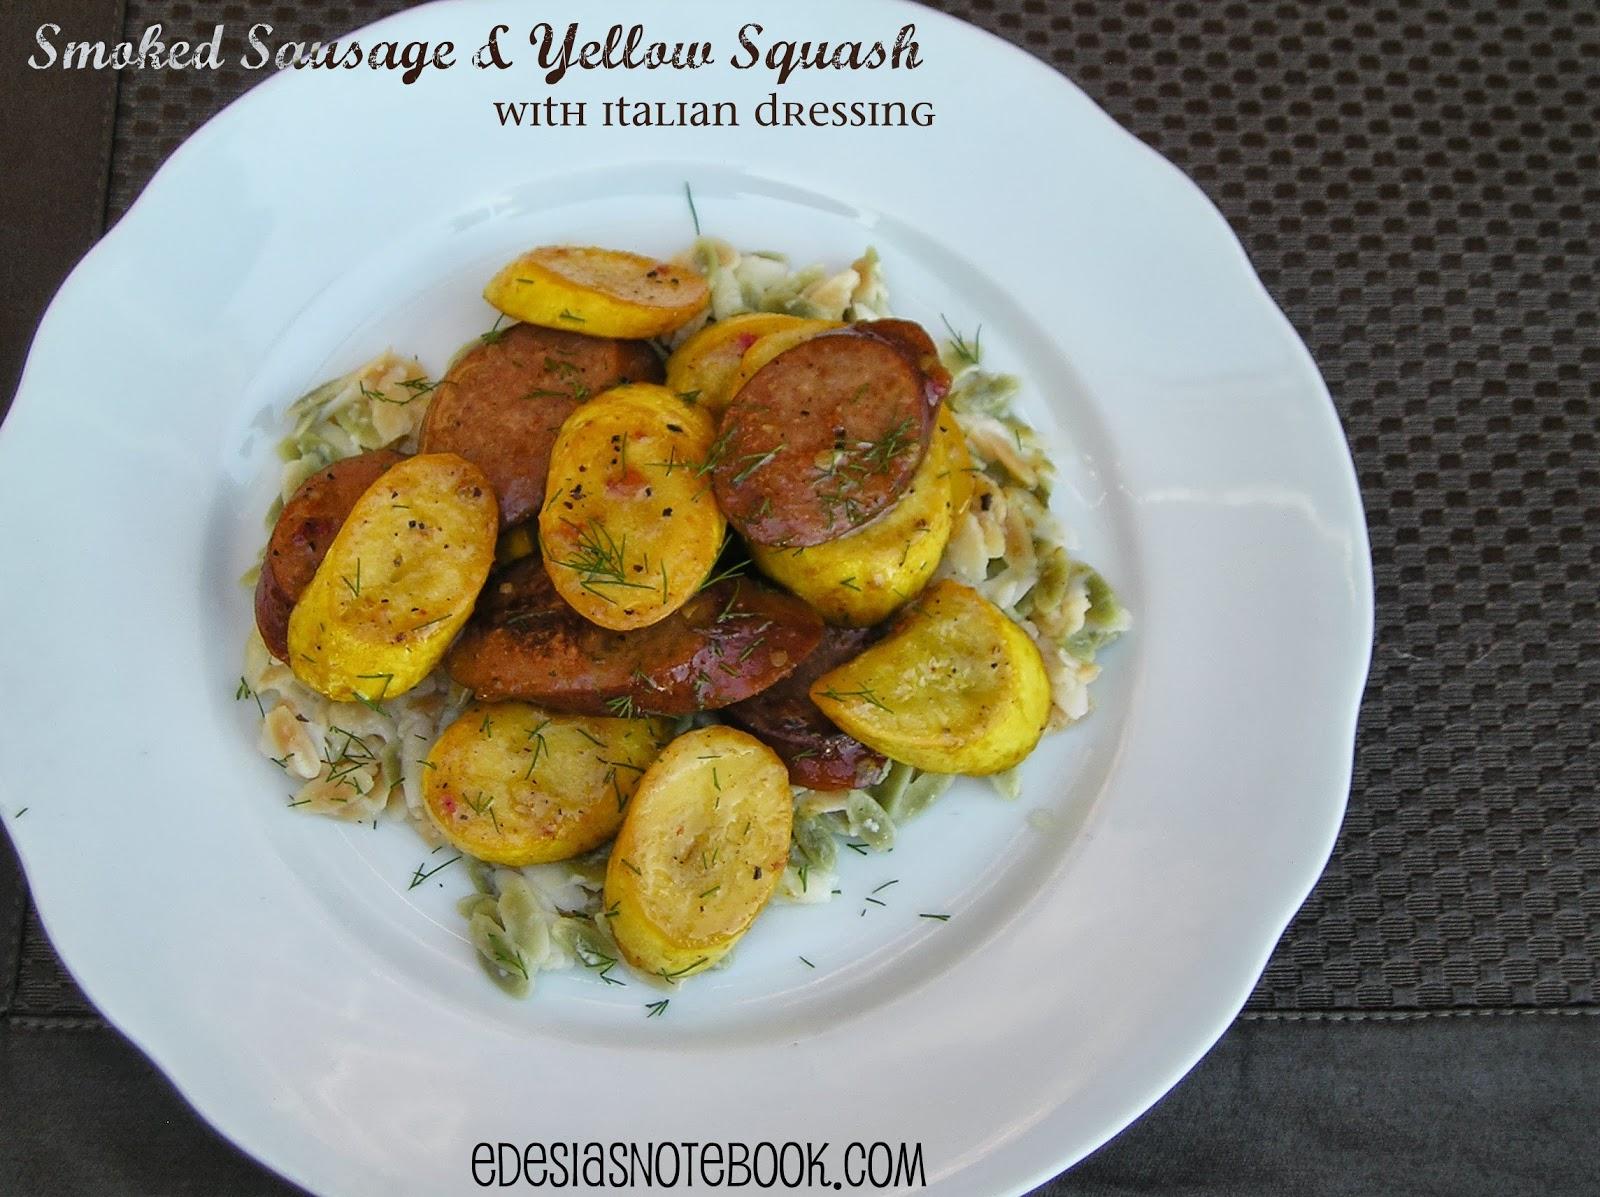 Smoked sausage and yellow squash with italian dressing edesias smoked sausage and yellow squash with italian dressing forumfinder Image collections